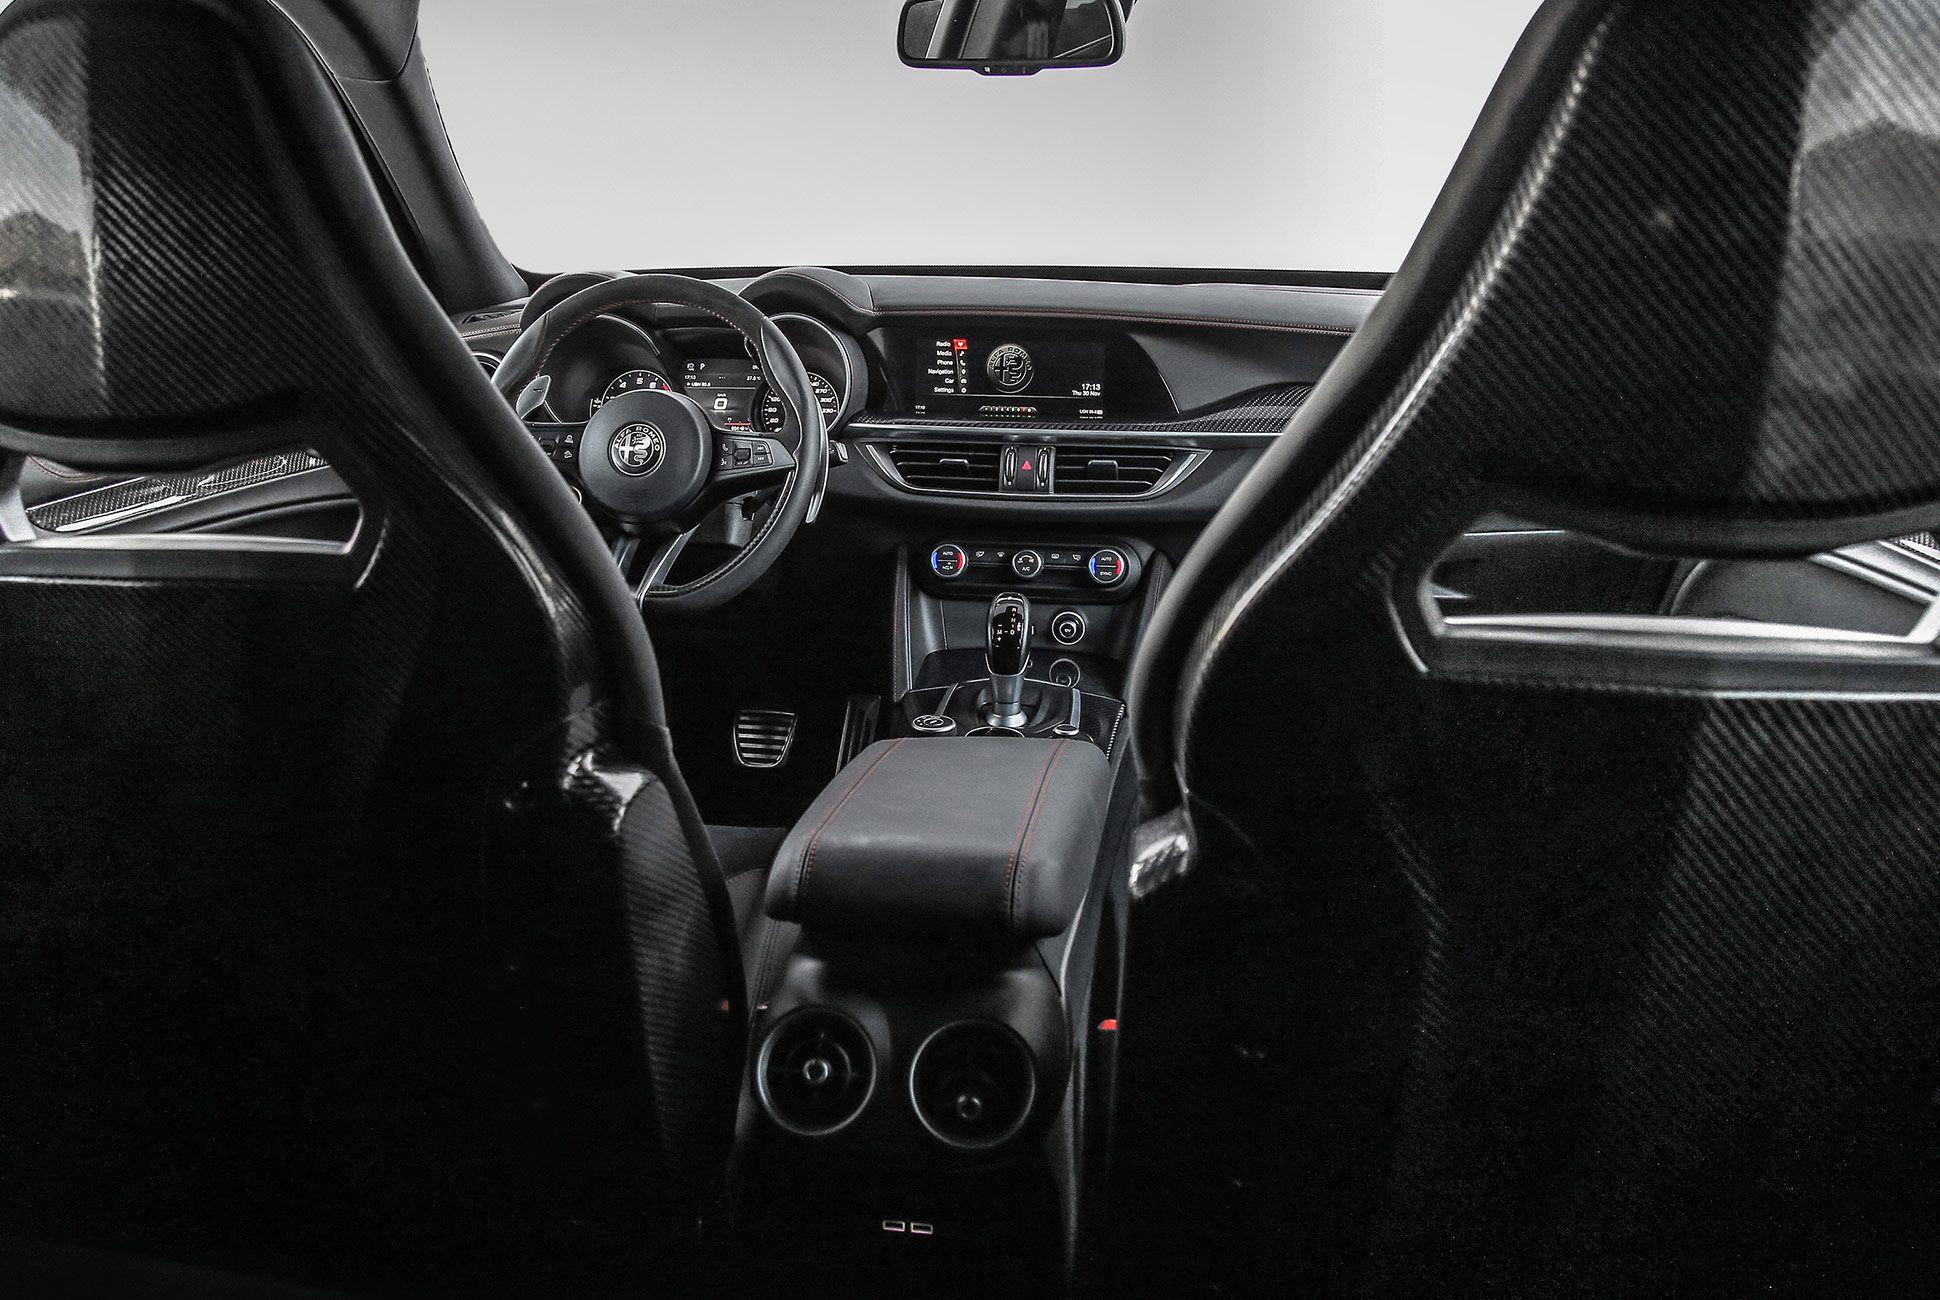 Alfa-Romeo-Quadrifoglio-Stelvia-and-Giulia-gear-patrol-slide-11